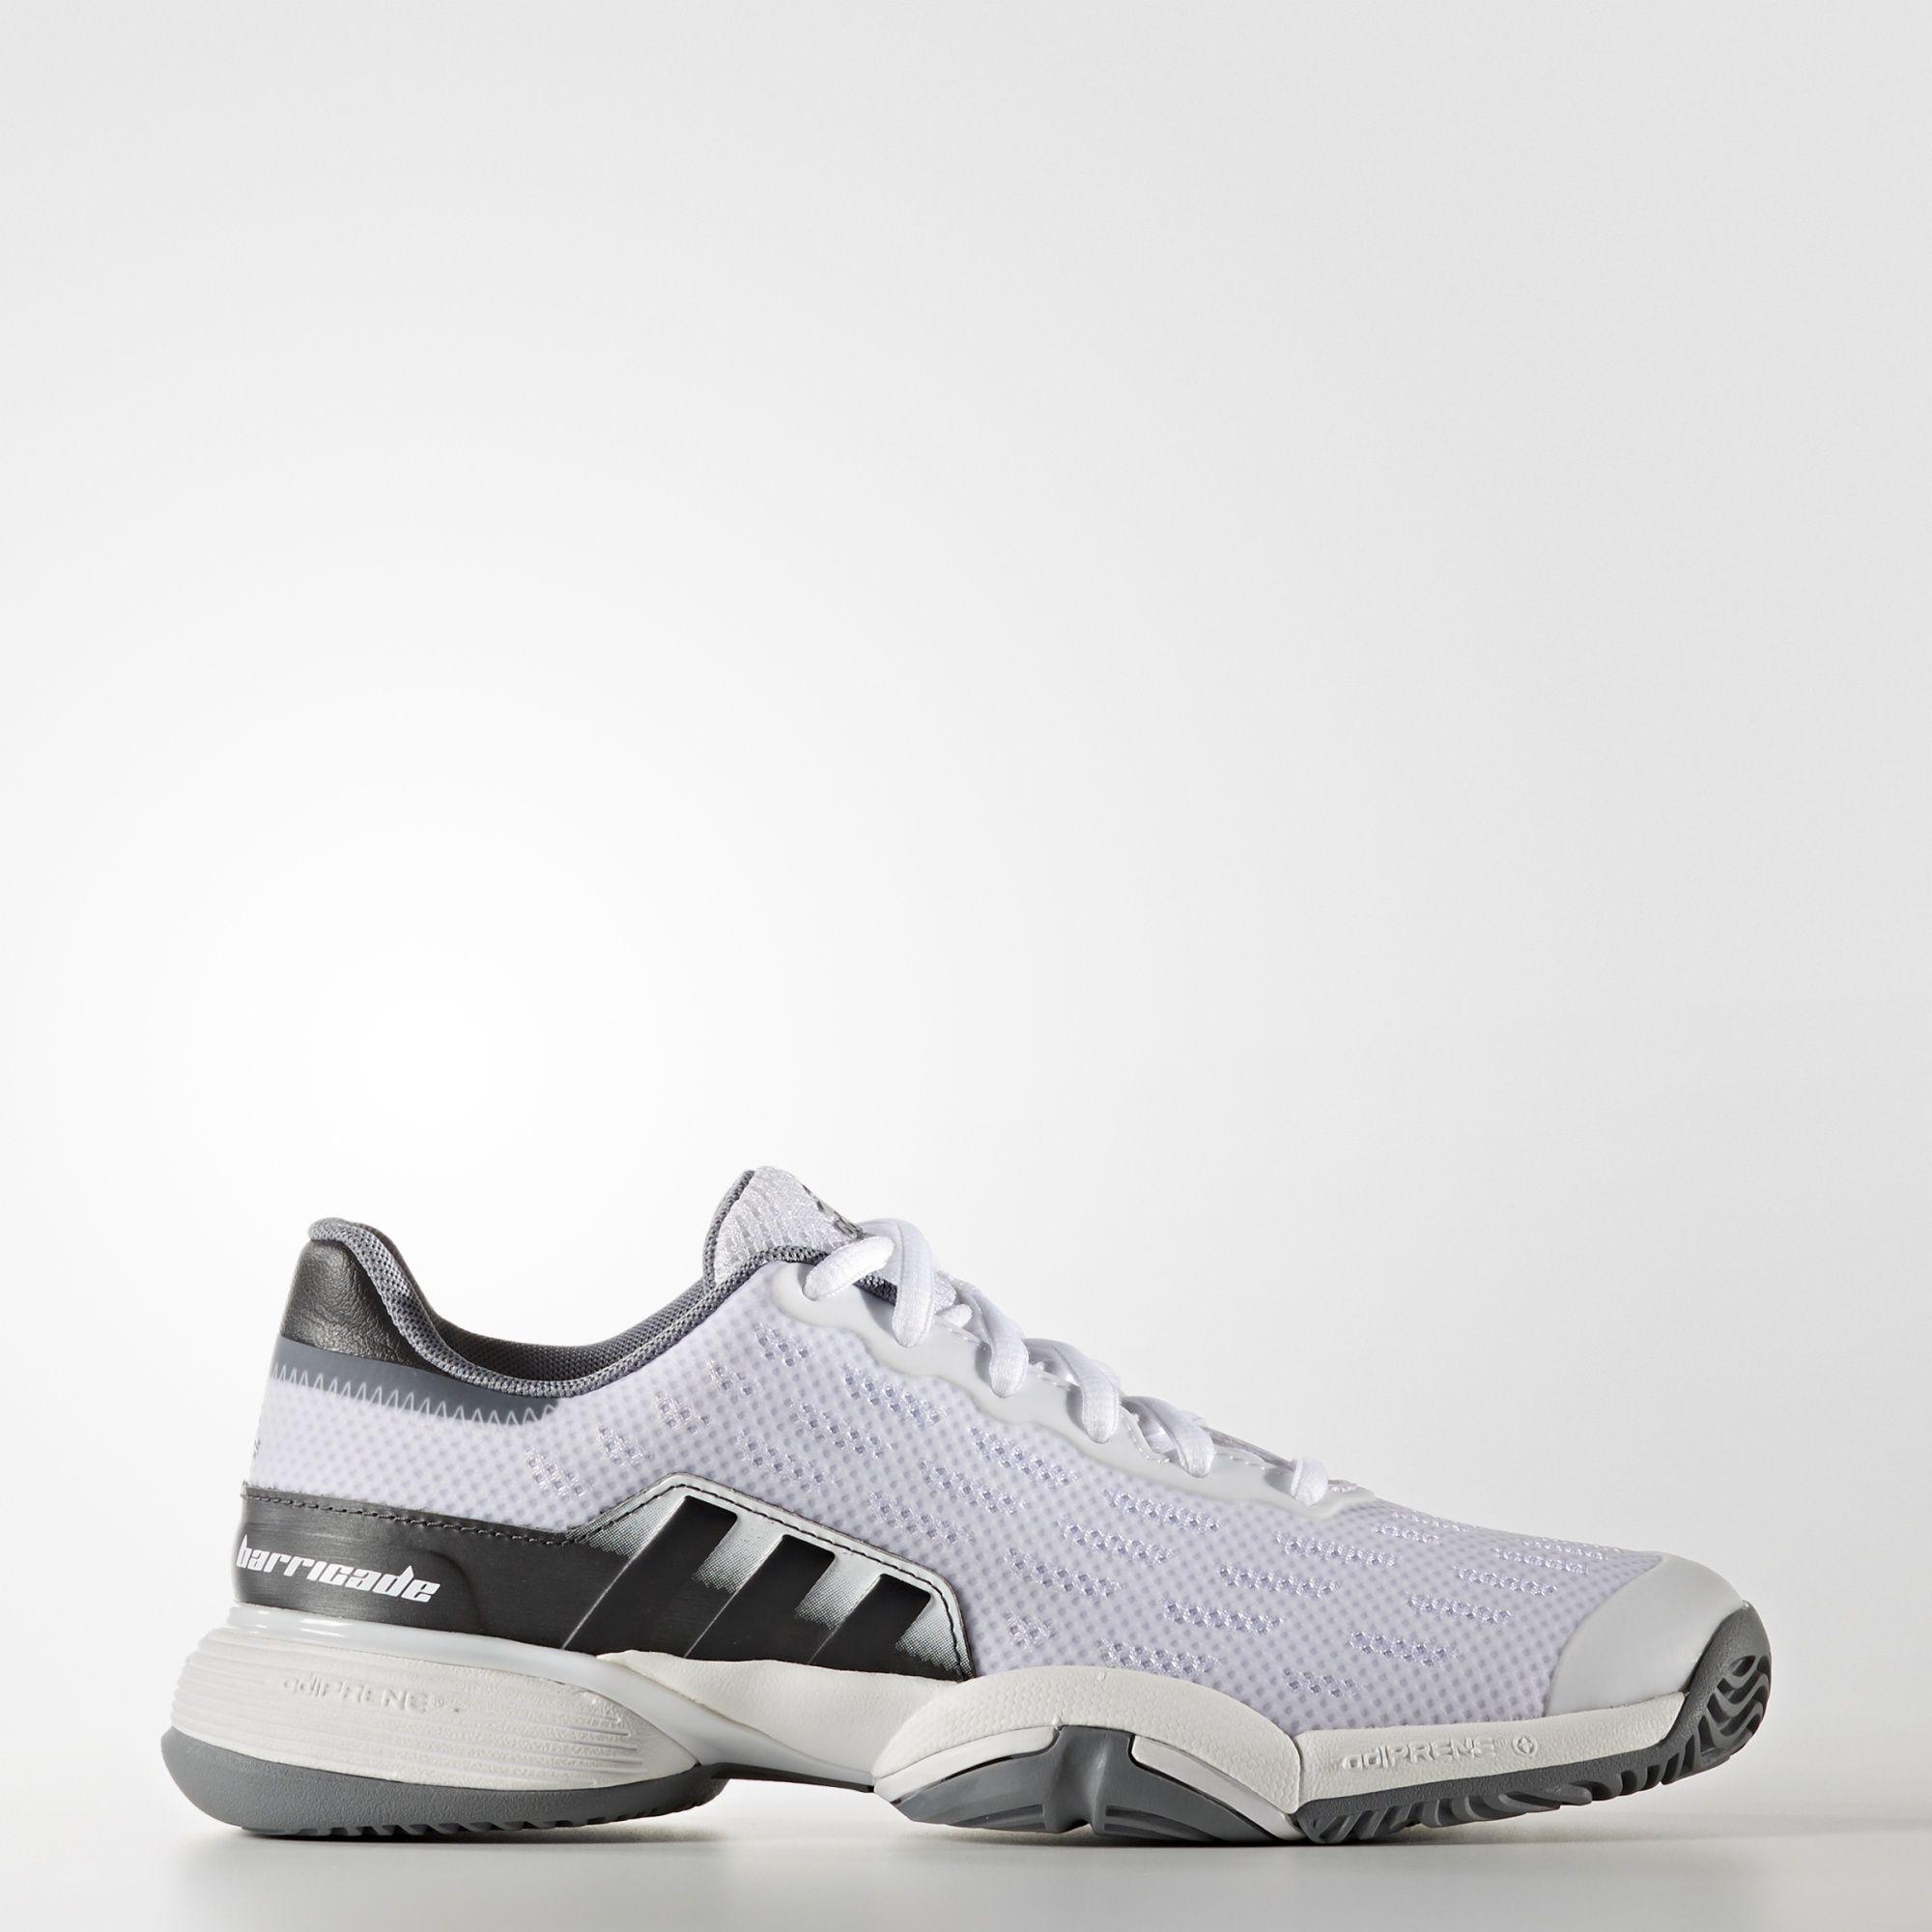 adidas barricade tennis shoes white grey